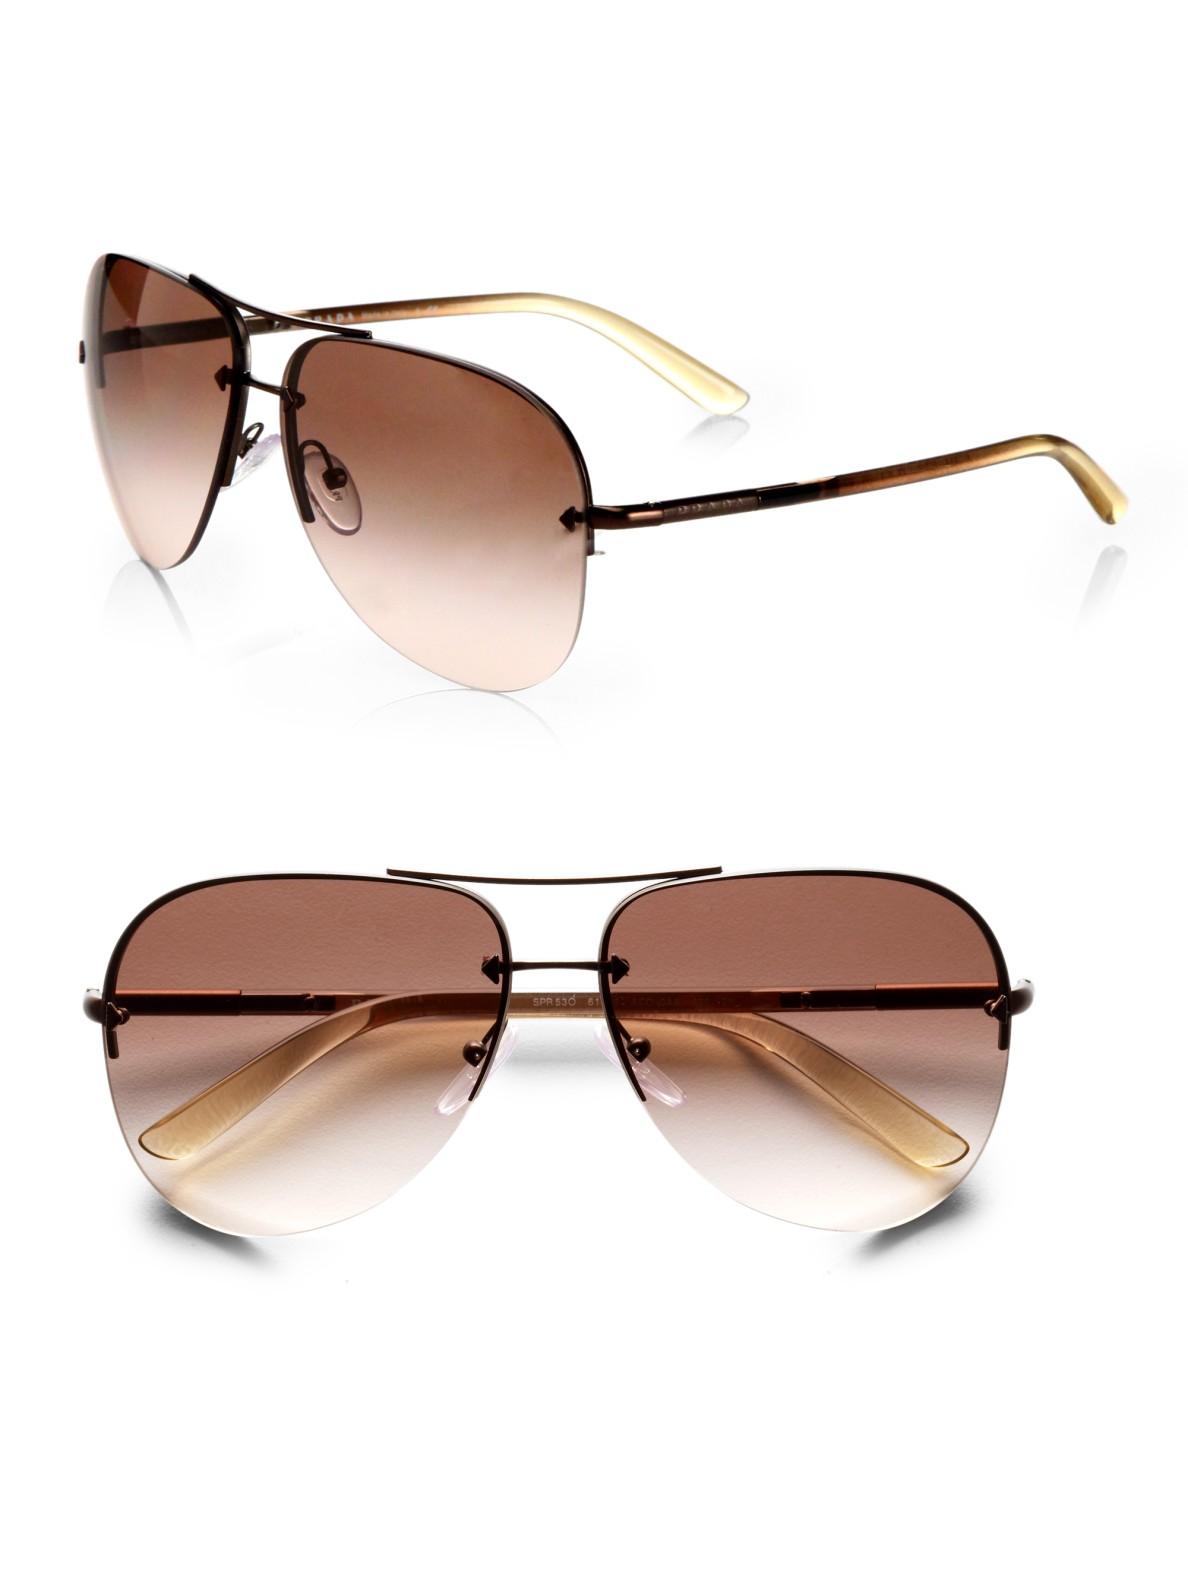 Maui Jim Warranty >> Prada Rimless Aviator Sunglasses in Brown - Lyst